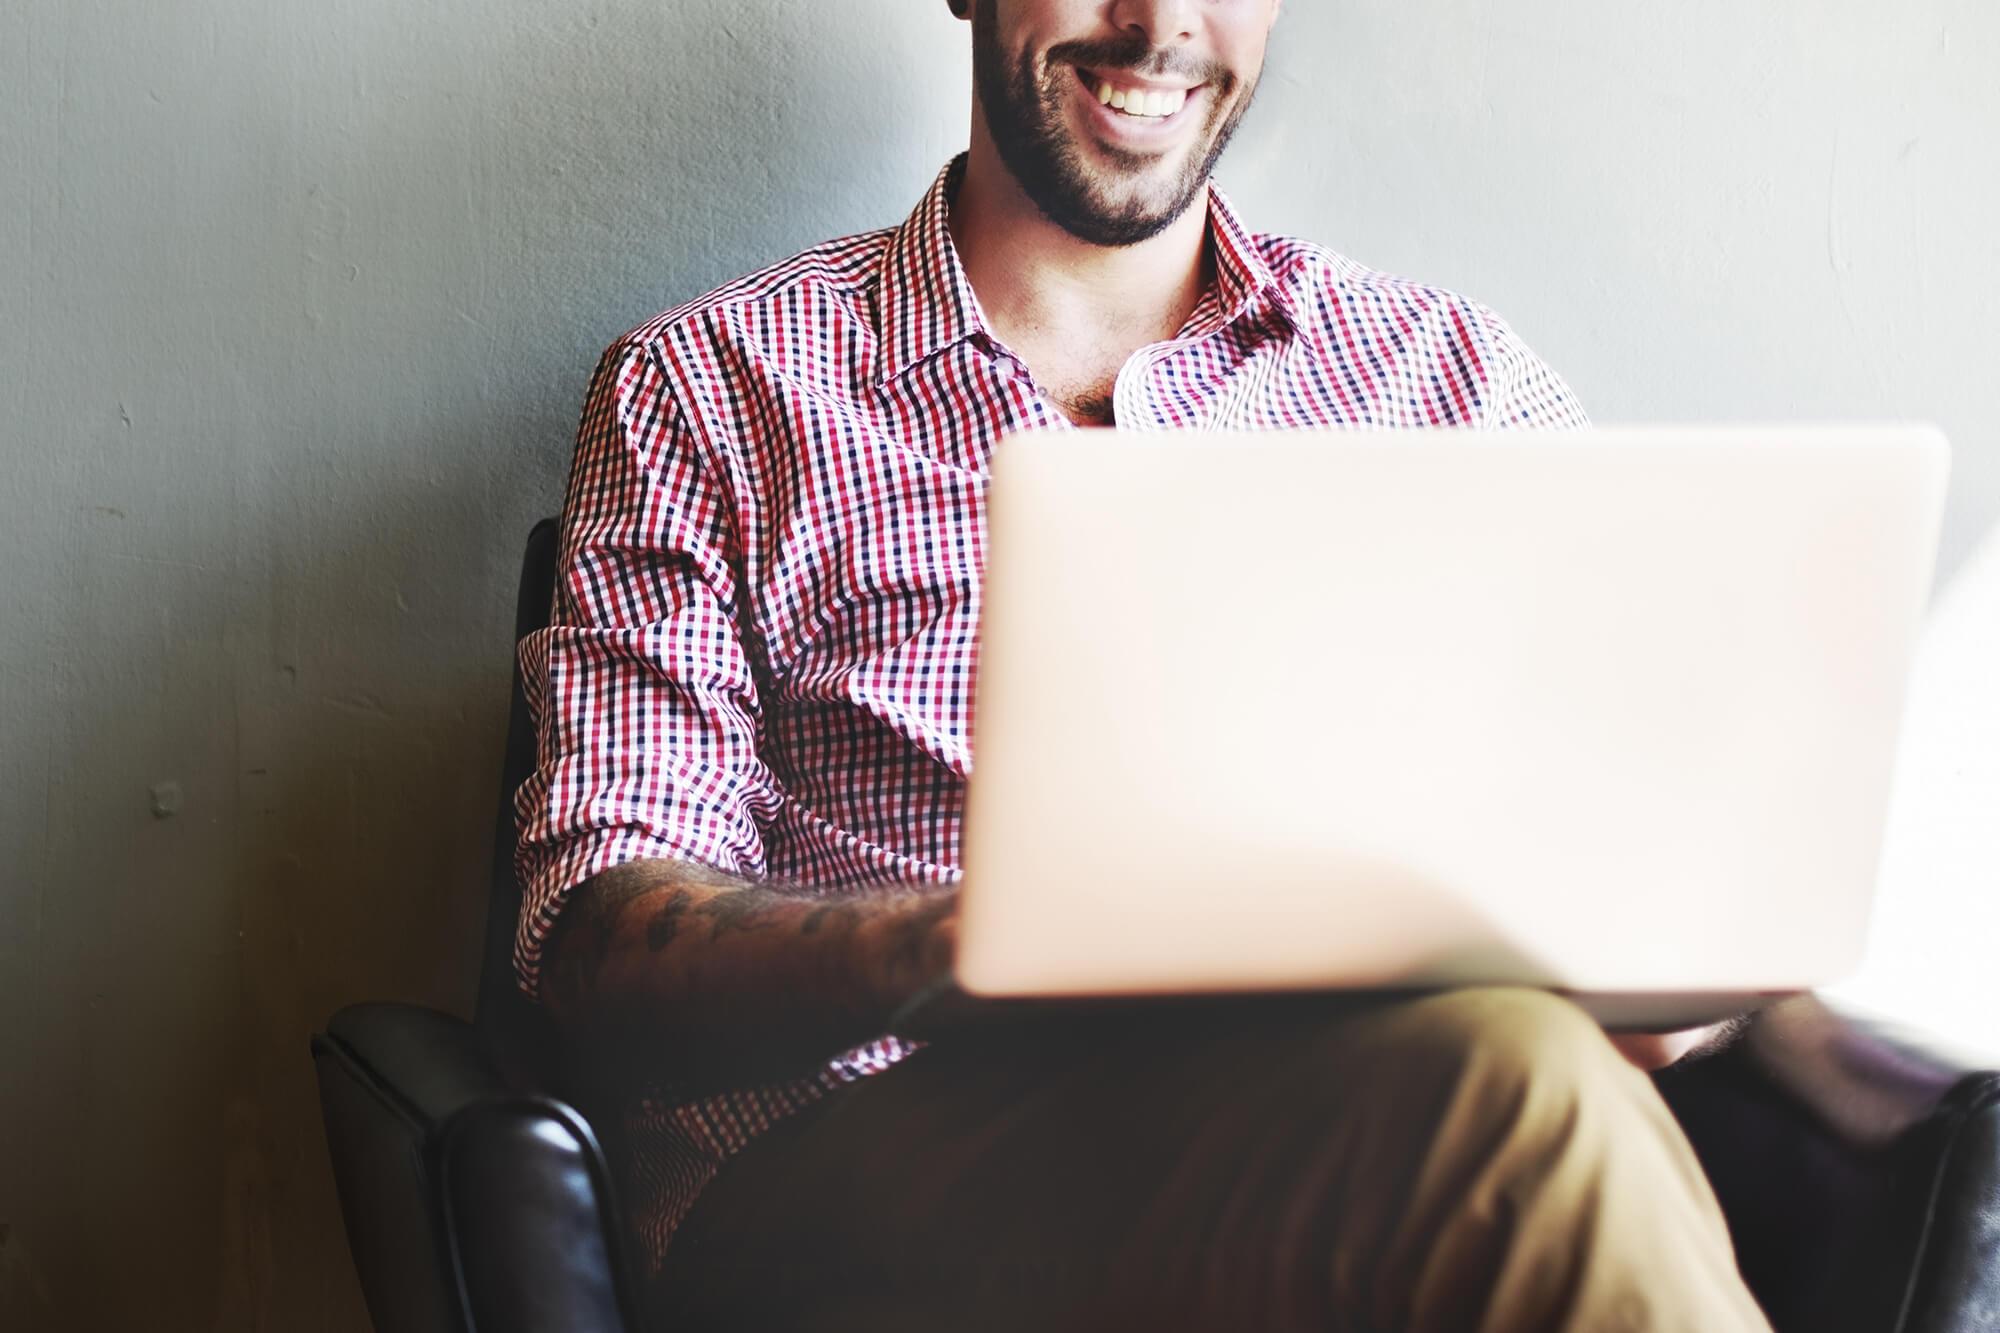 Man sat with laptop on lap smiling